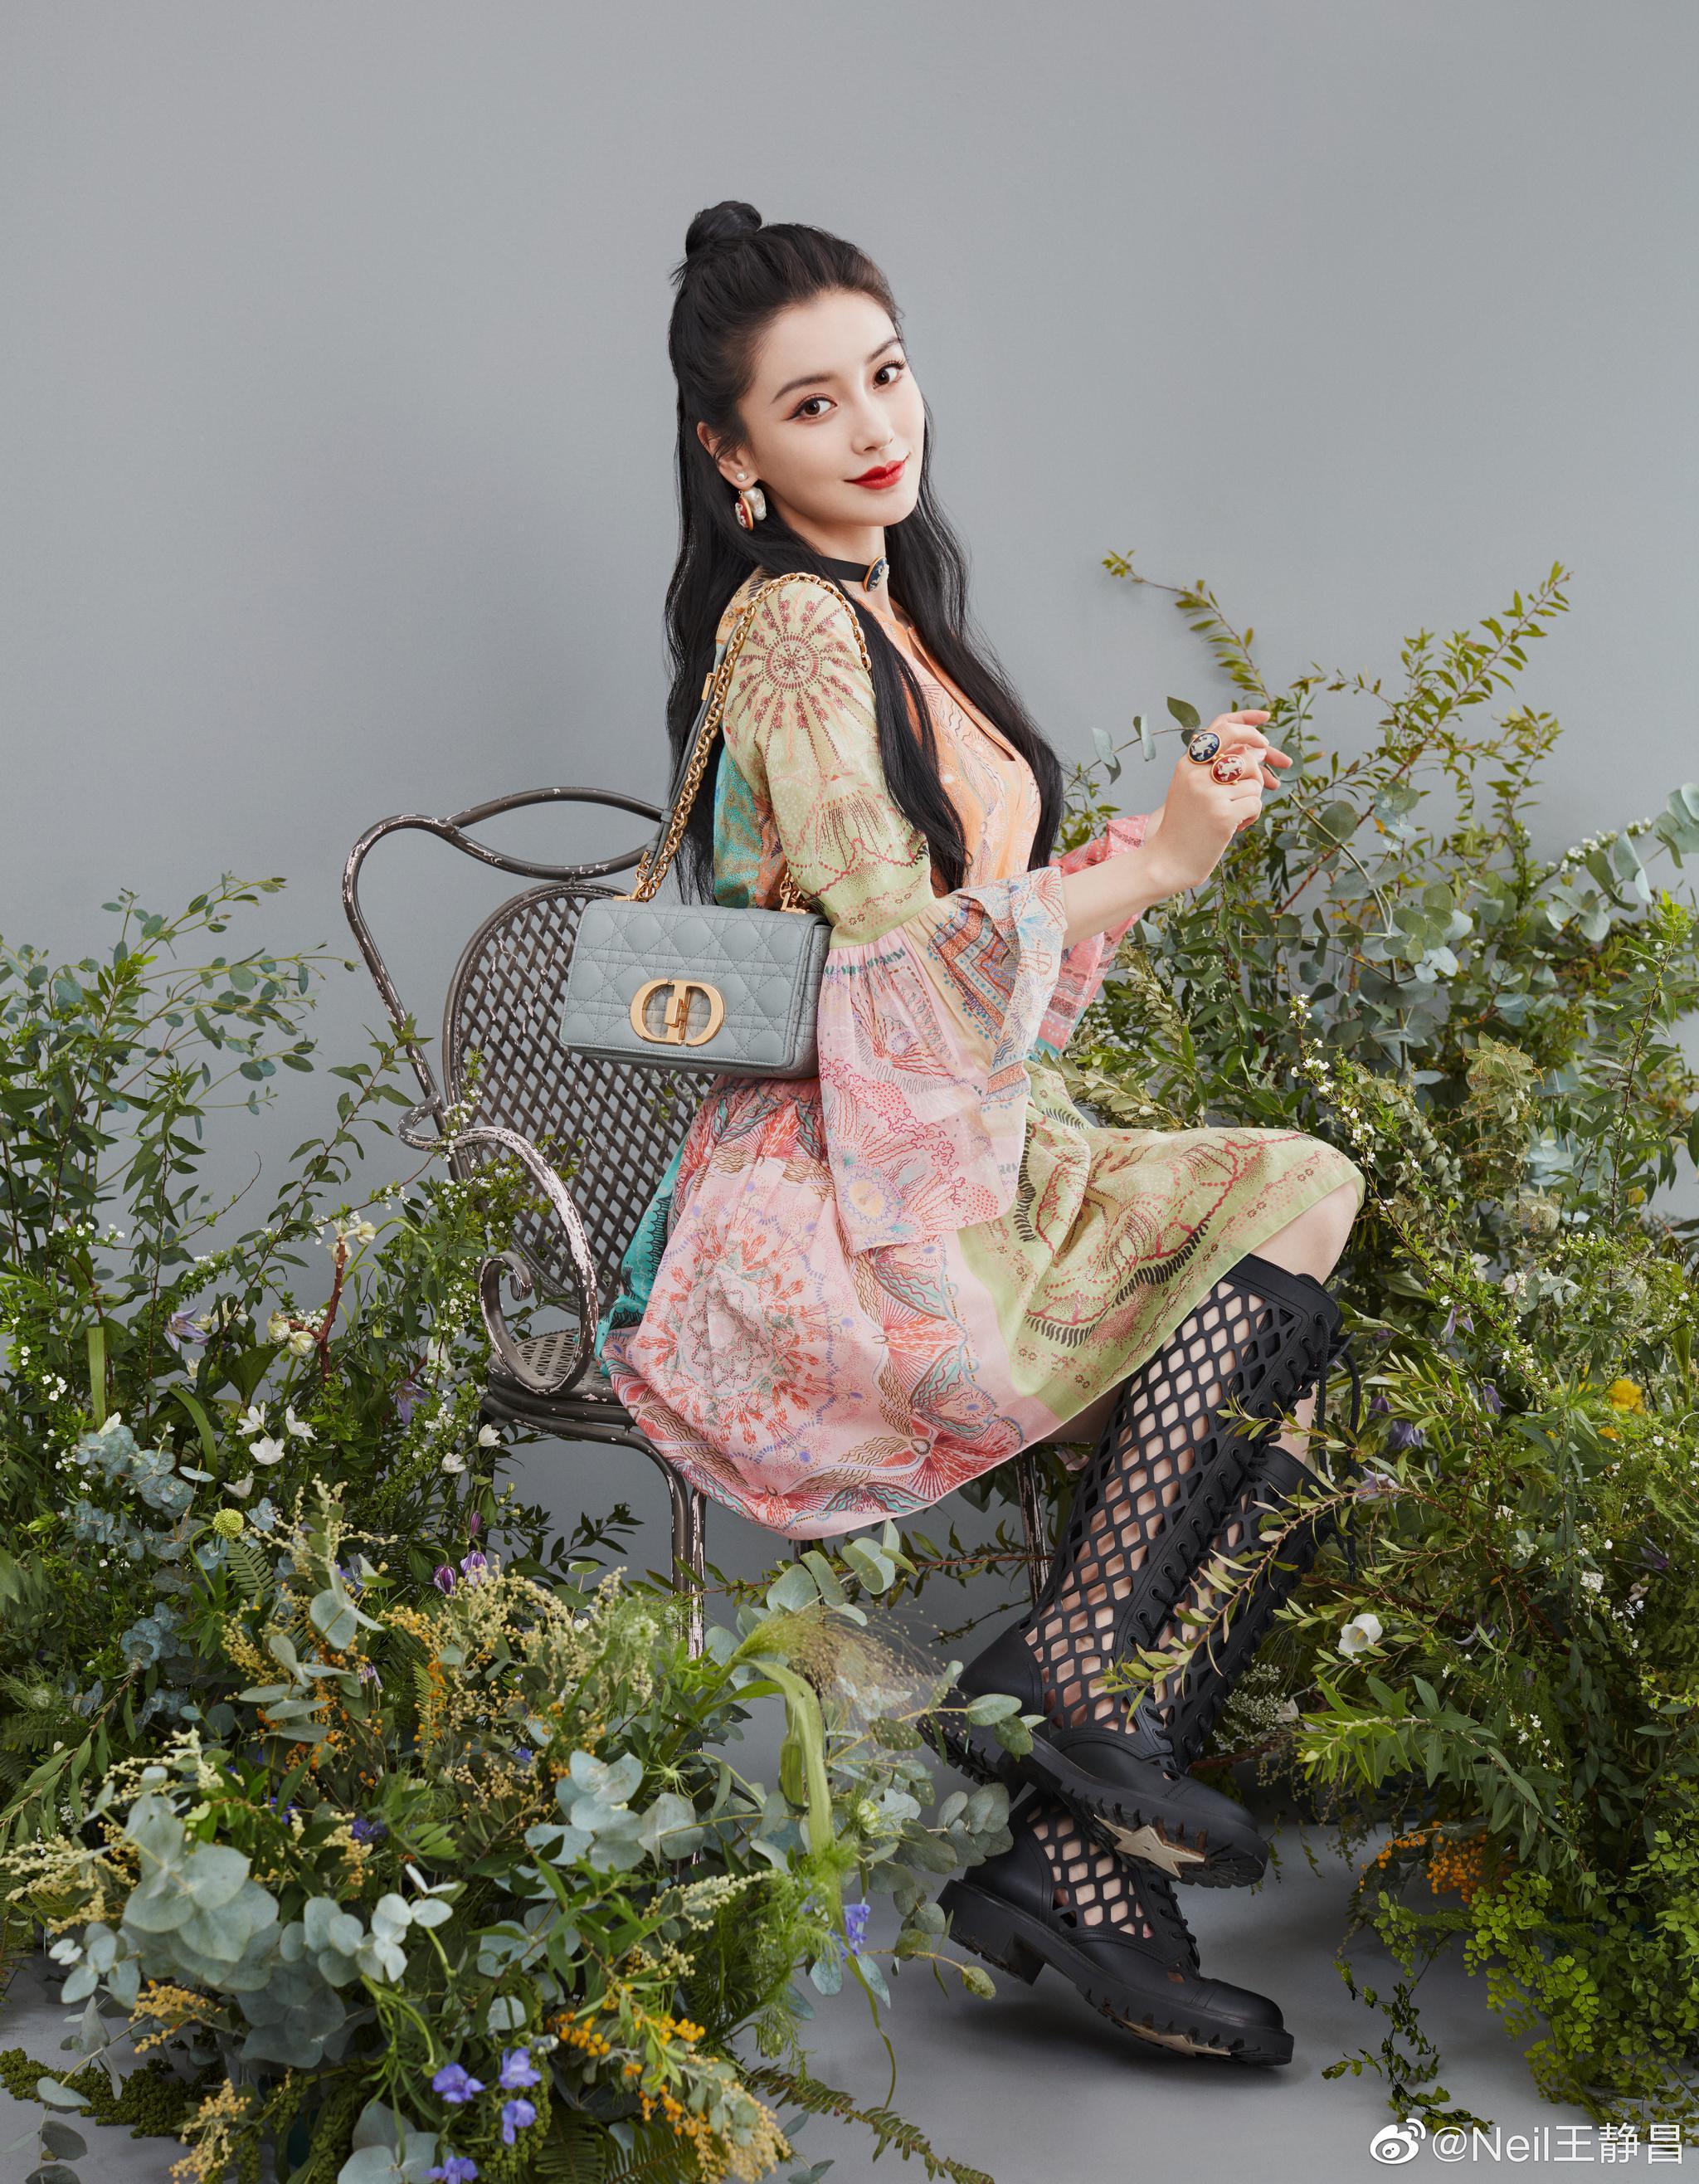 DIOR 的一个手袋系列找来一帮女星拍宣传照……